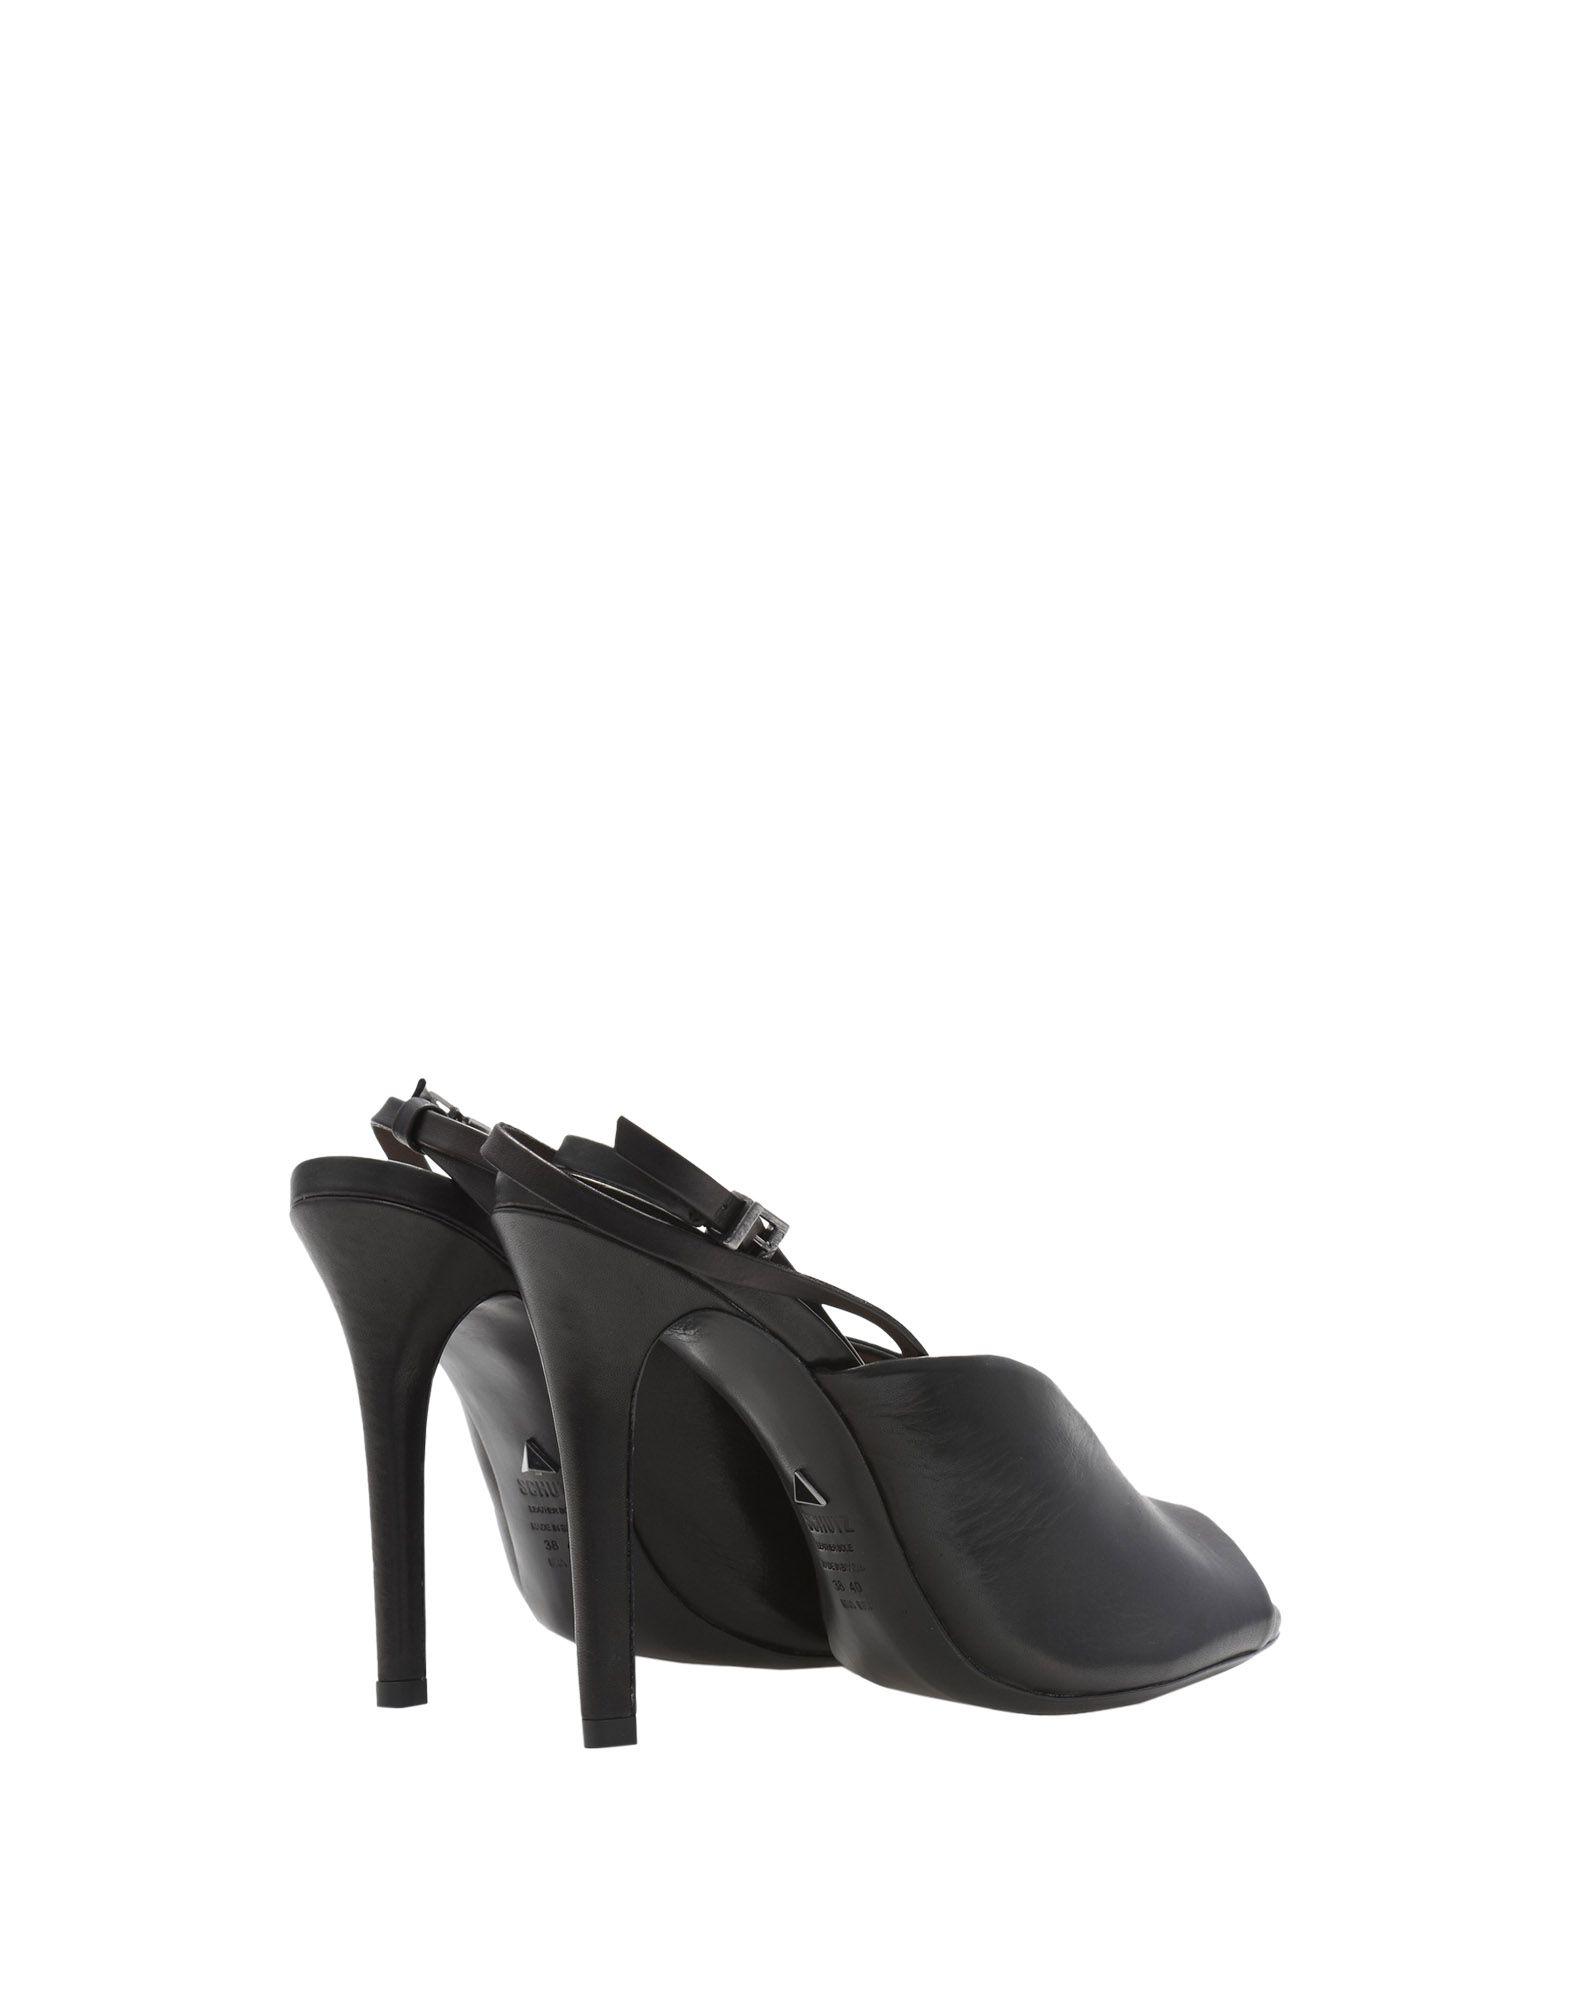 Stilvolle billige  Schuhe Schutz Sandalen Damen  billige 11482686QN 88a5a1